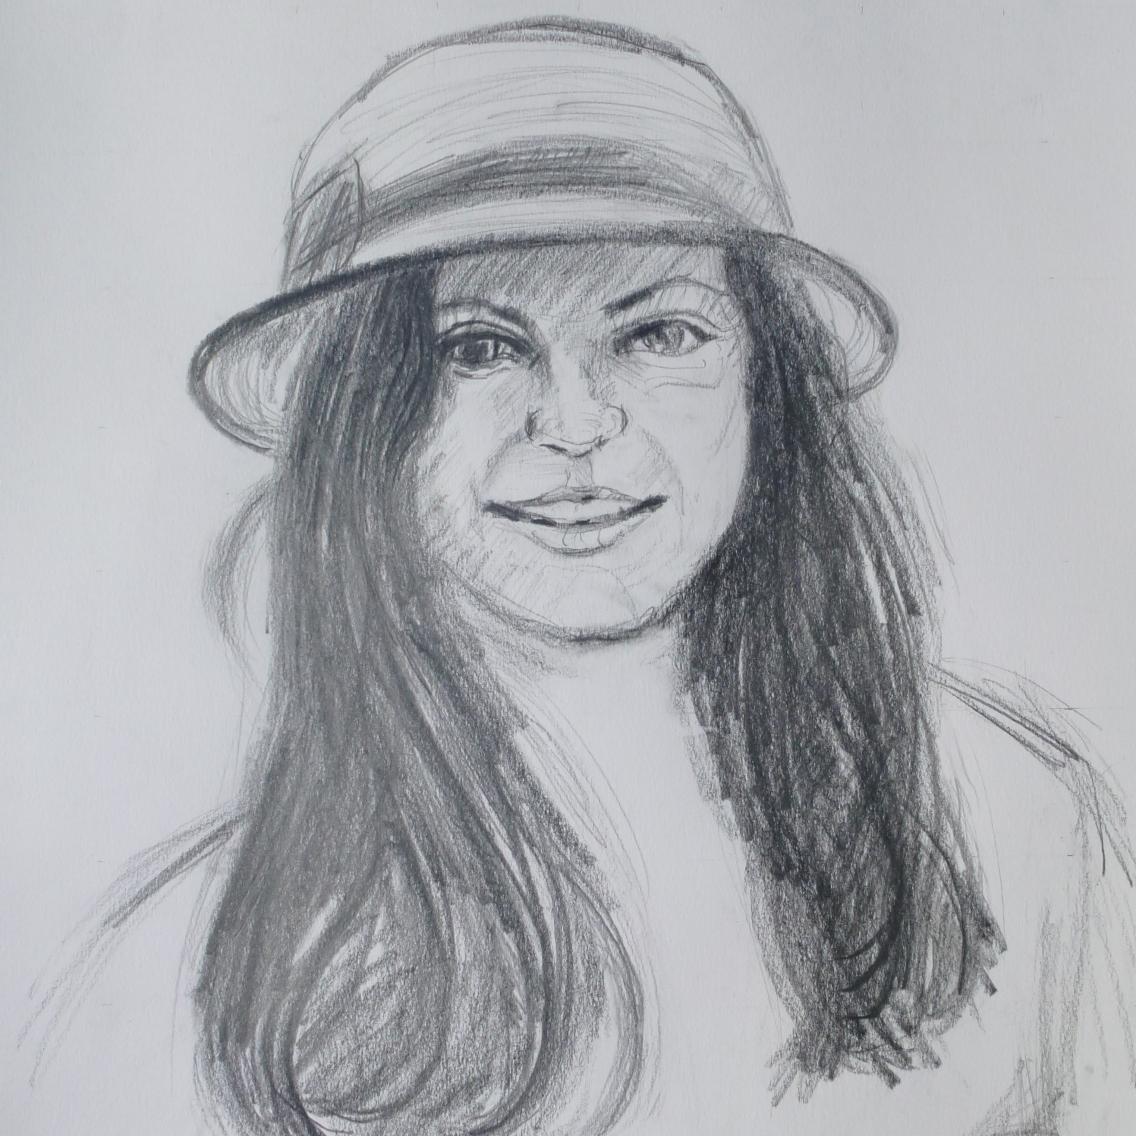 Anna Glück by Gazmend Freitag, 2016